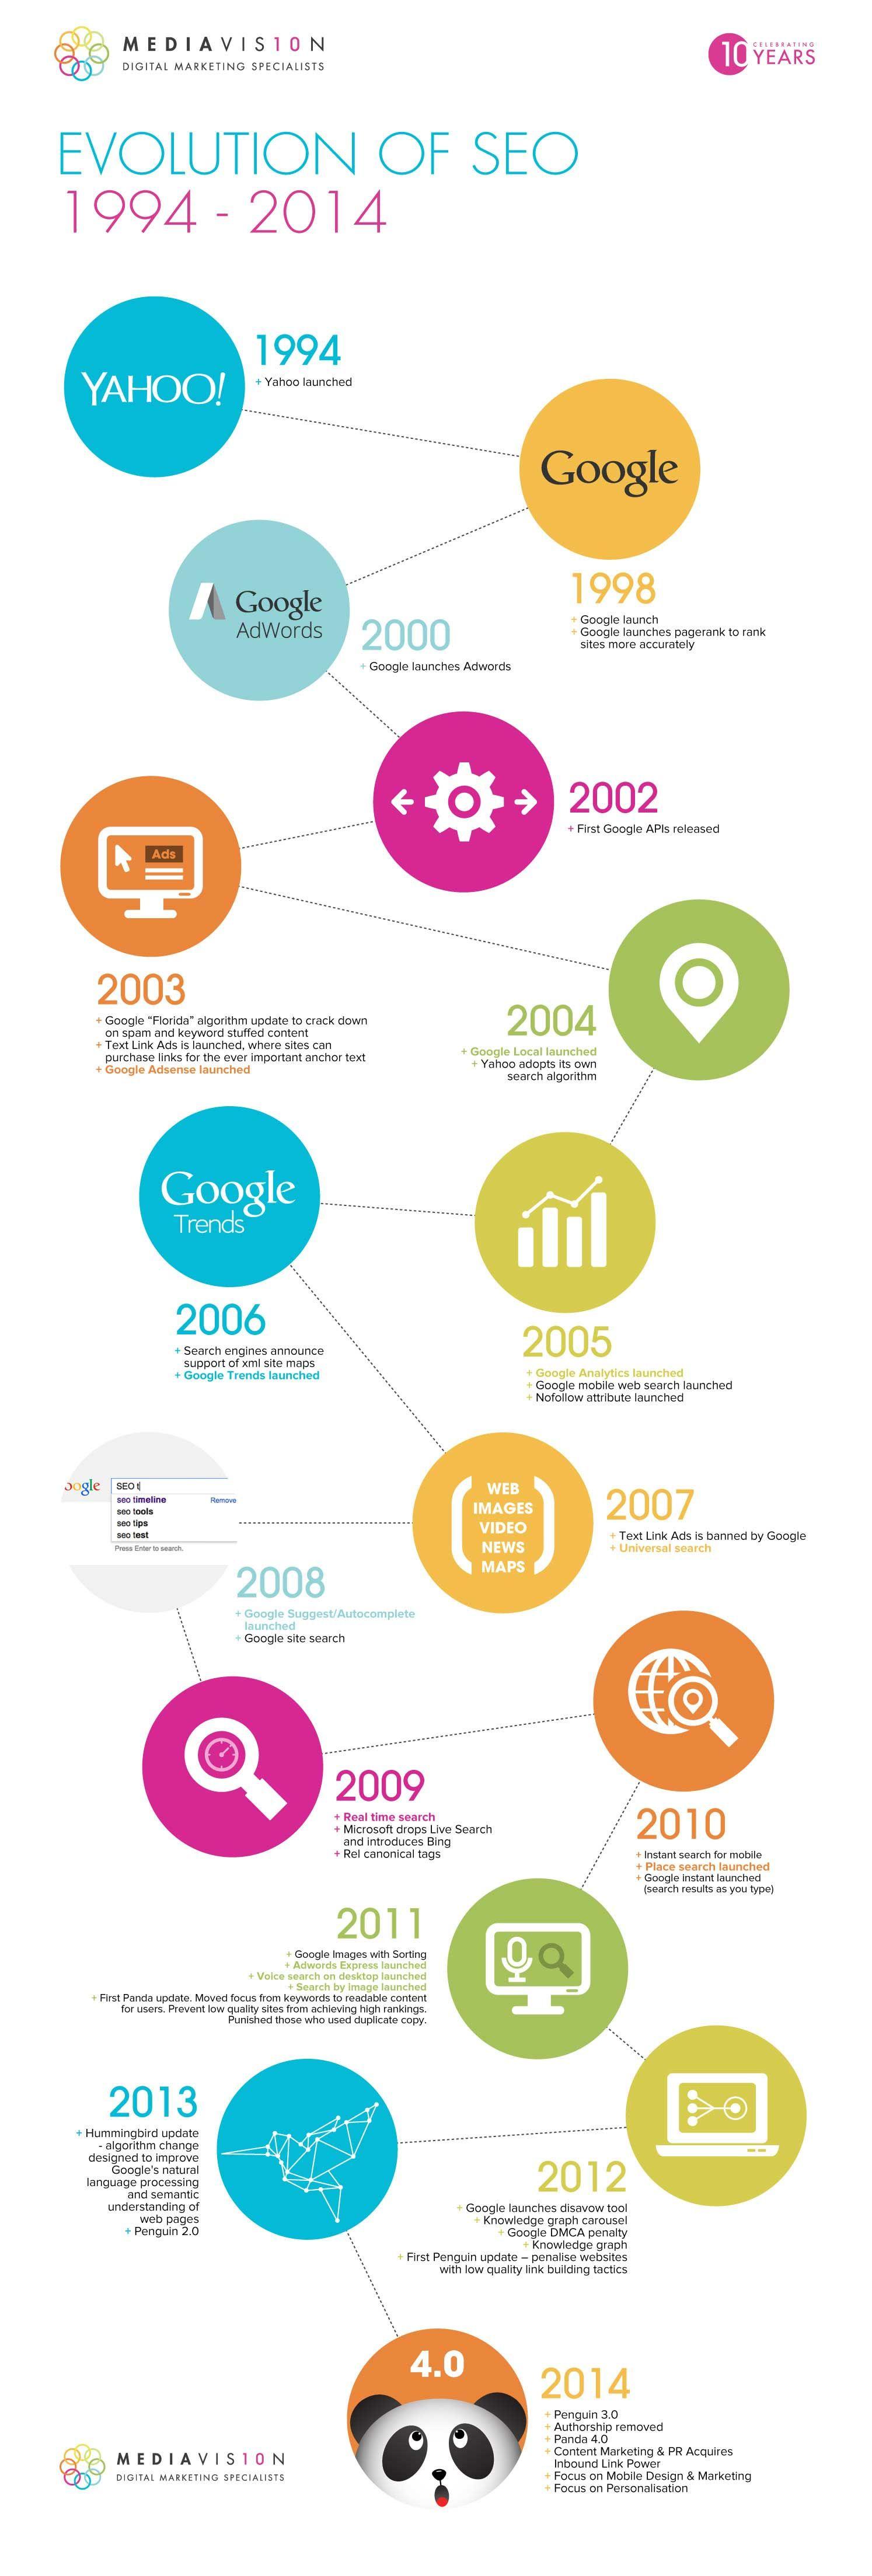 SEO Evolution 19942014 Webmag.co Digital Resources